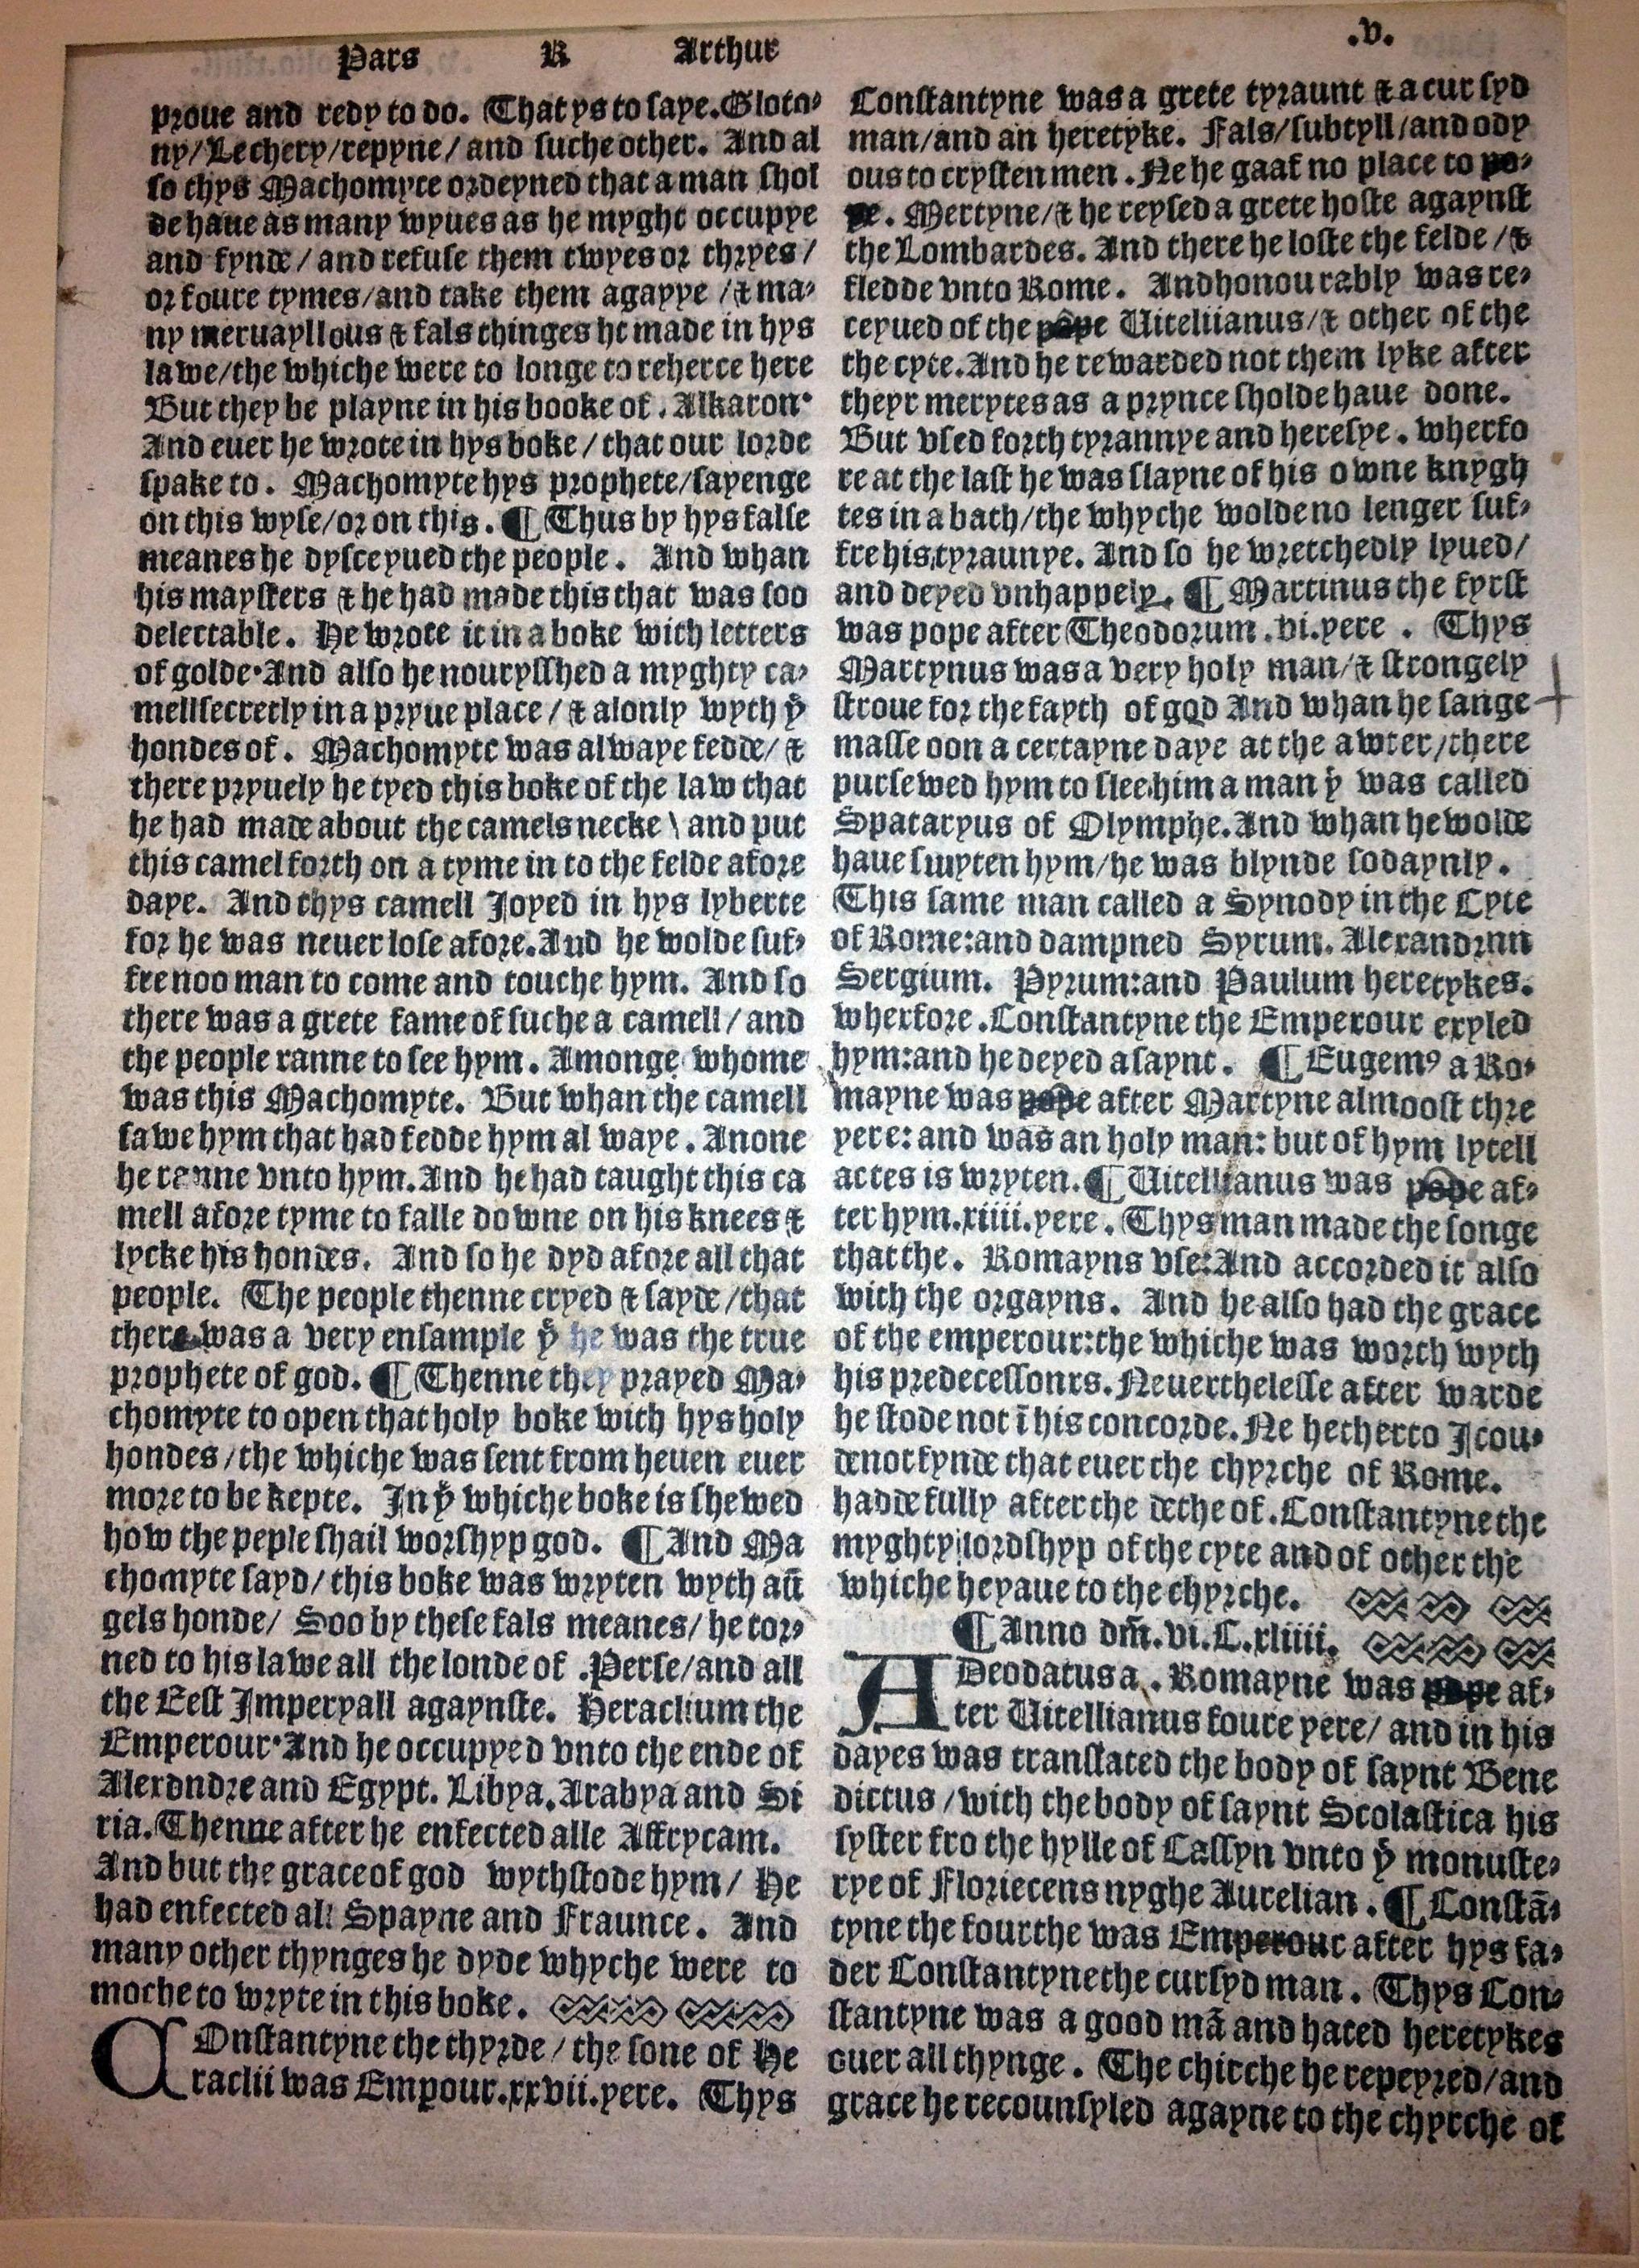 Chronicles of England, leaf, 1515.